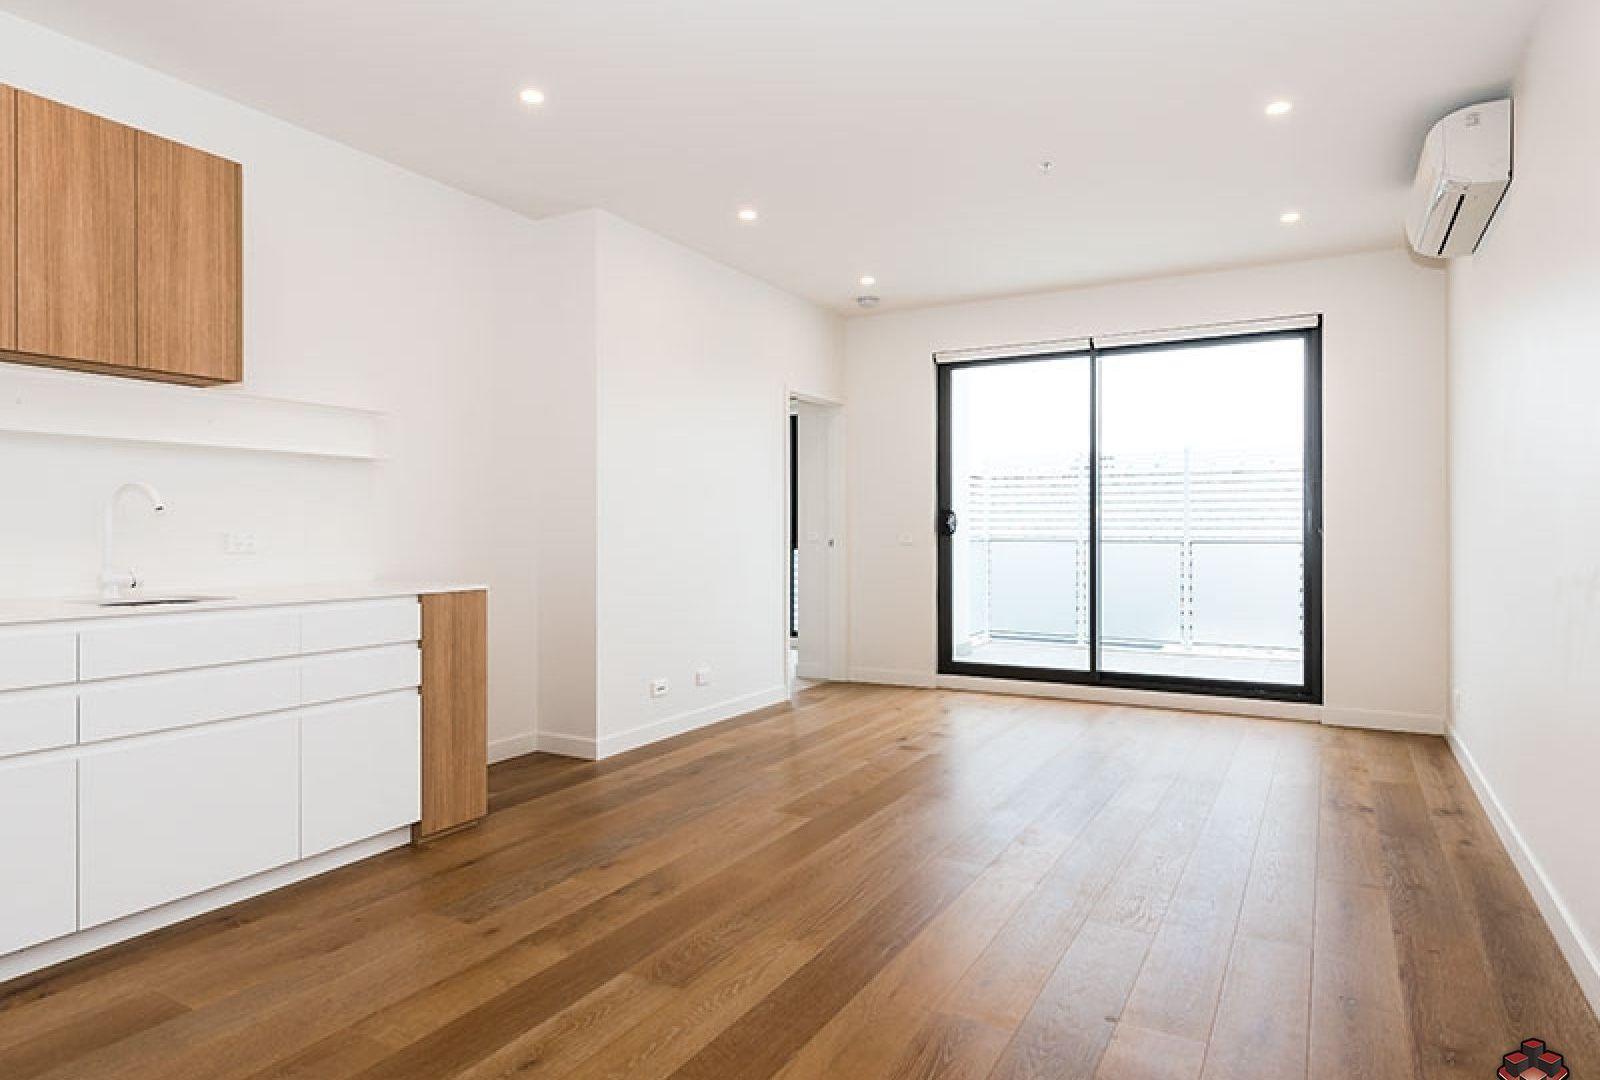 Apartment 205/ 14 -1 Maroona Road, Carnegie VIC 3163, Image 2